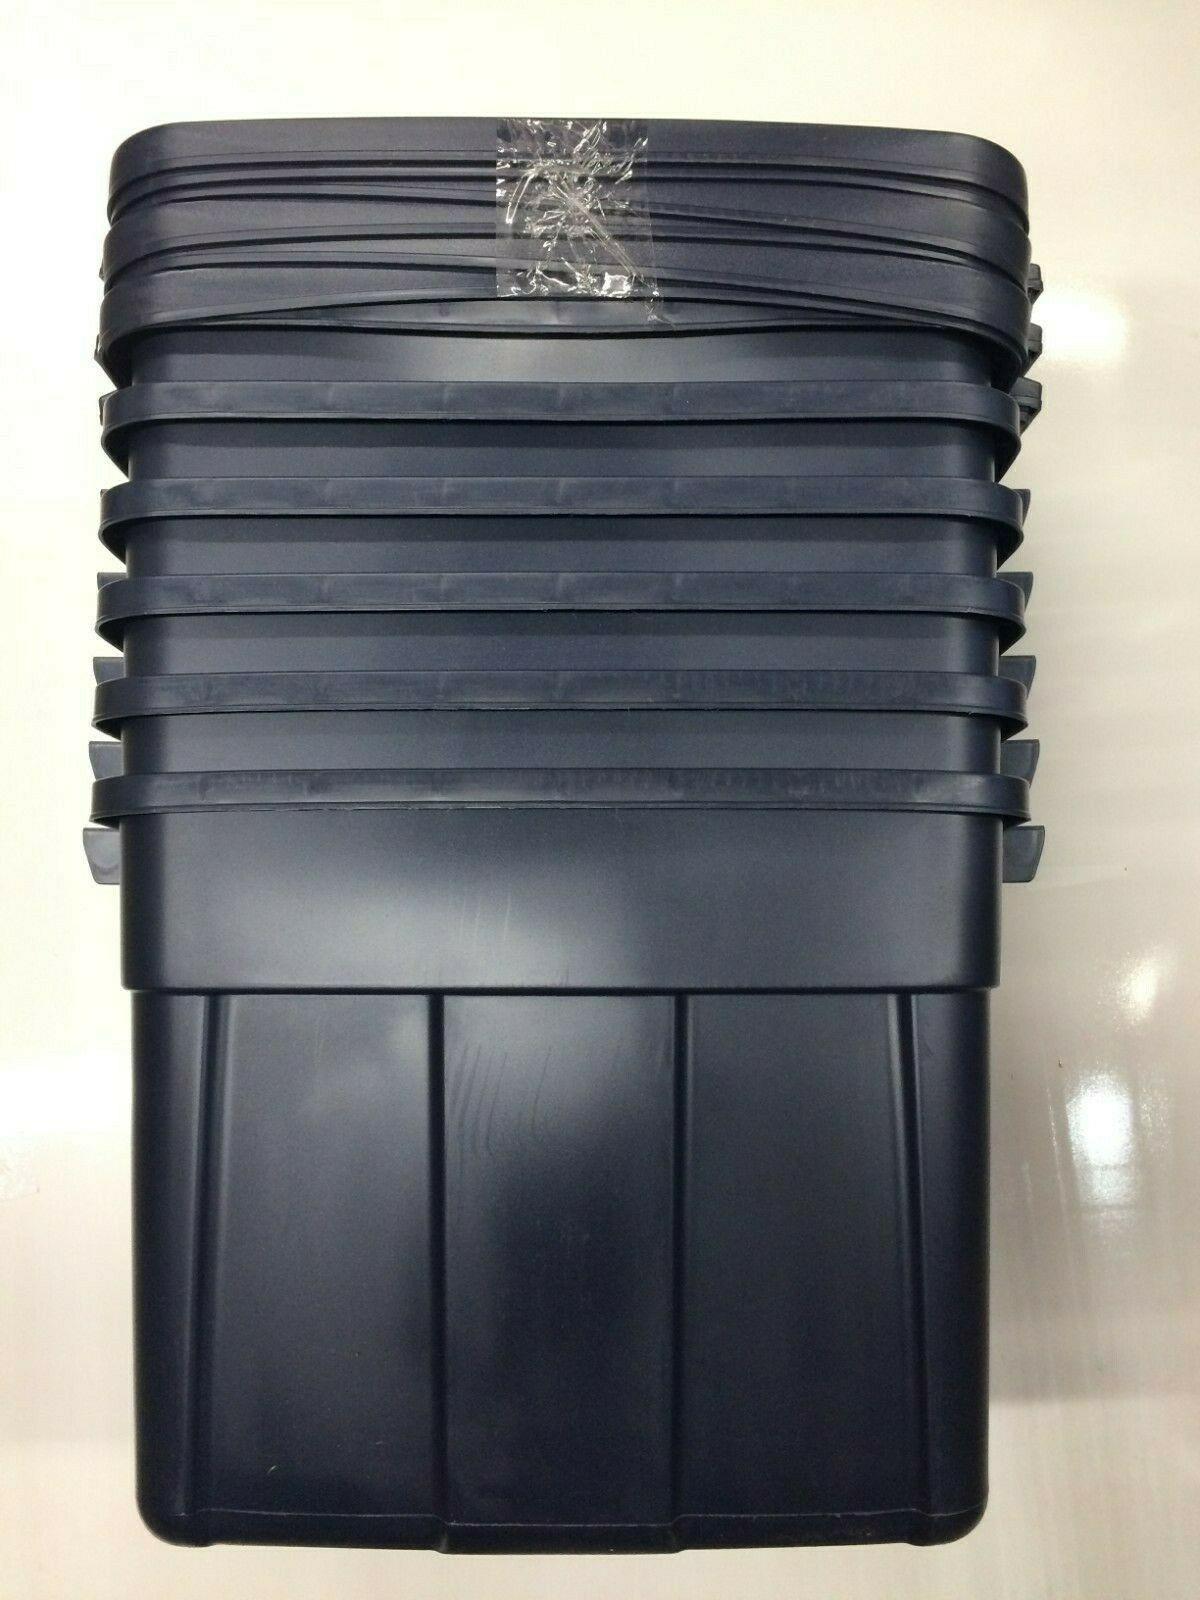 how big is an 18 gallon storage bin